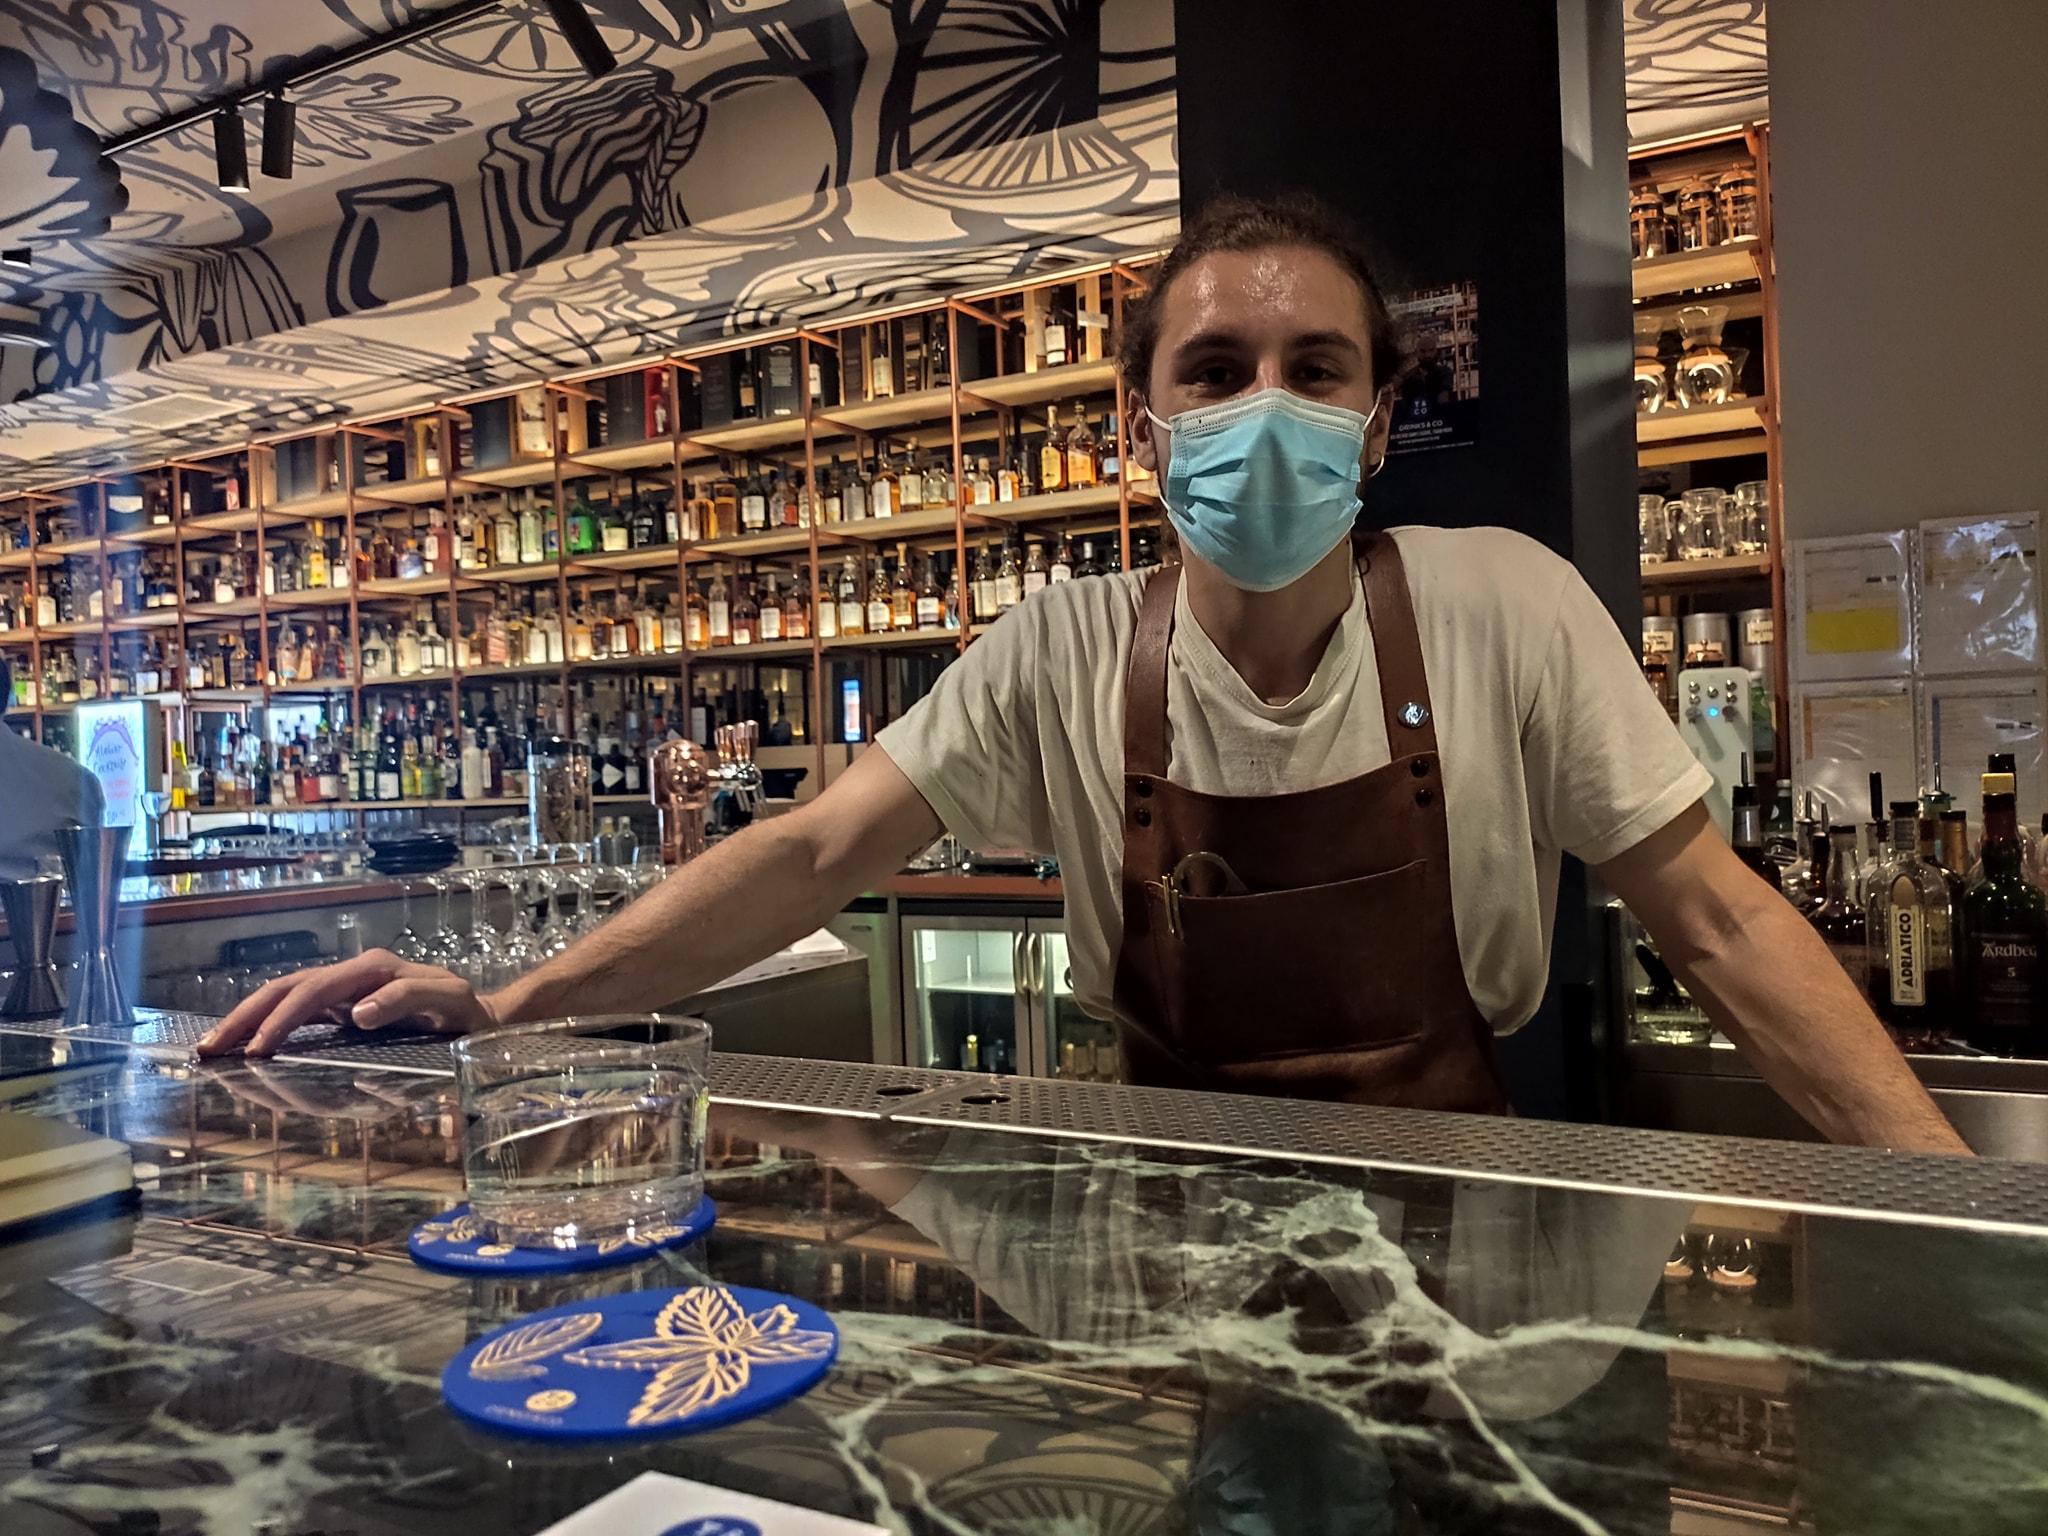 Maxime Brisville - Senior bartender - Drinks & Co